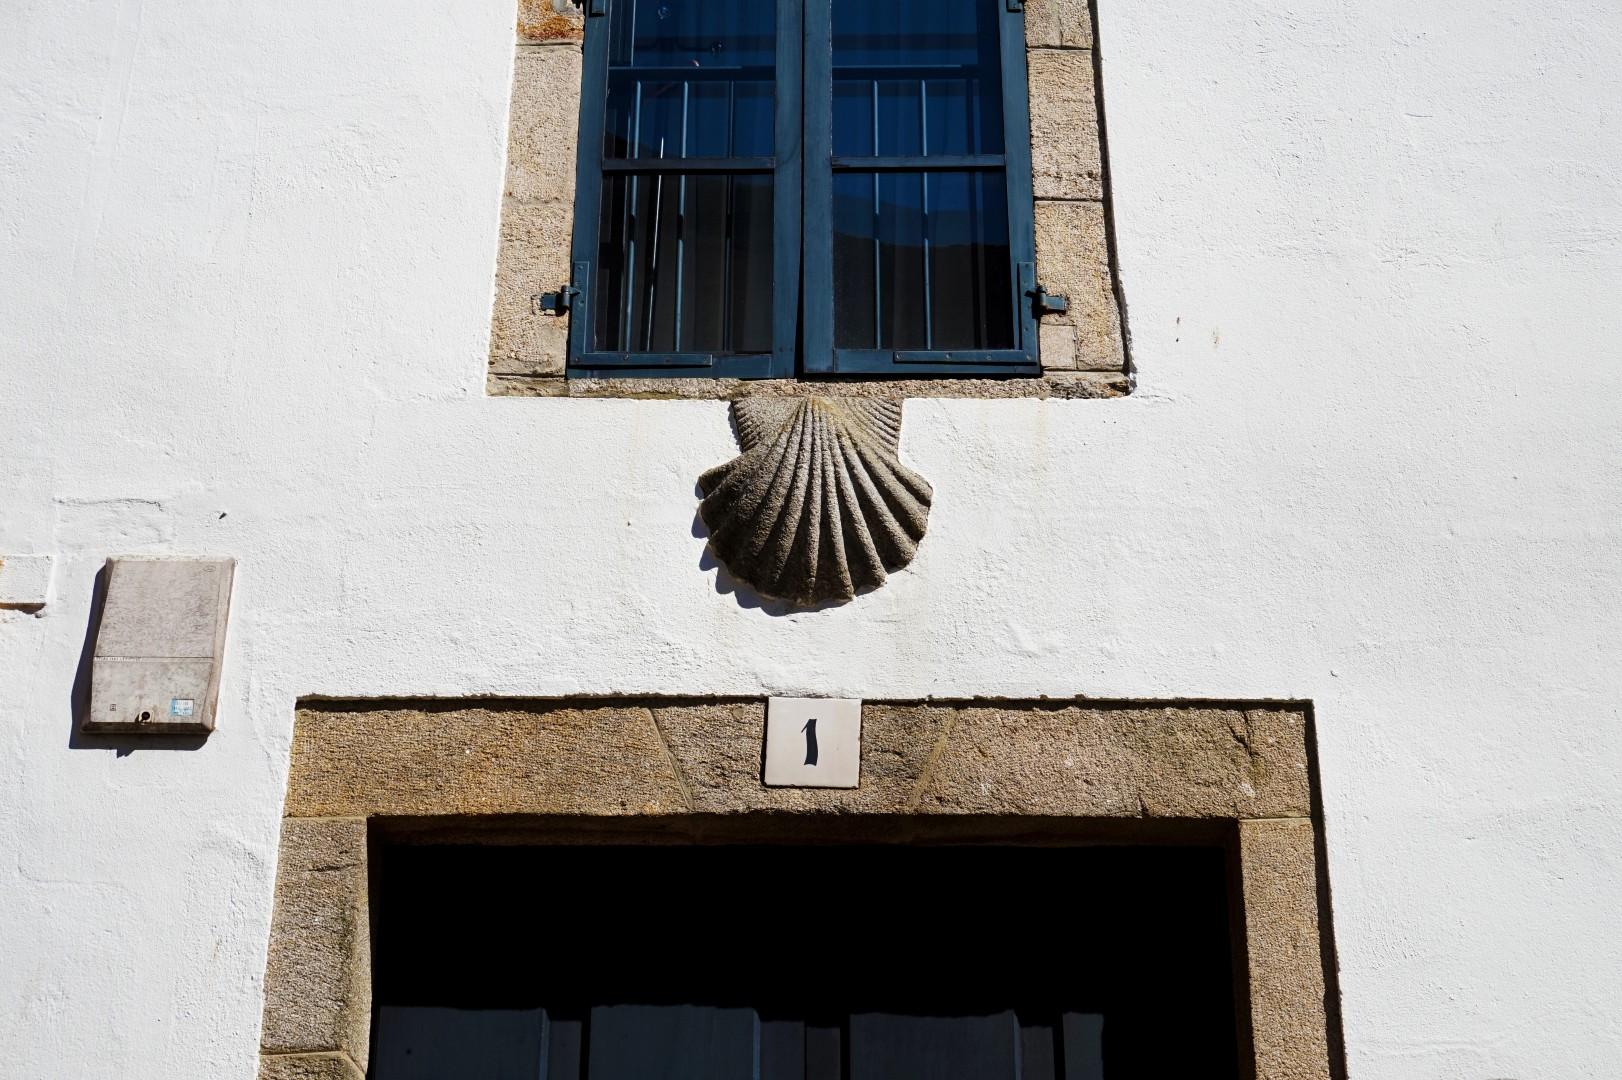 santiago_compostela (13) (Large)